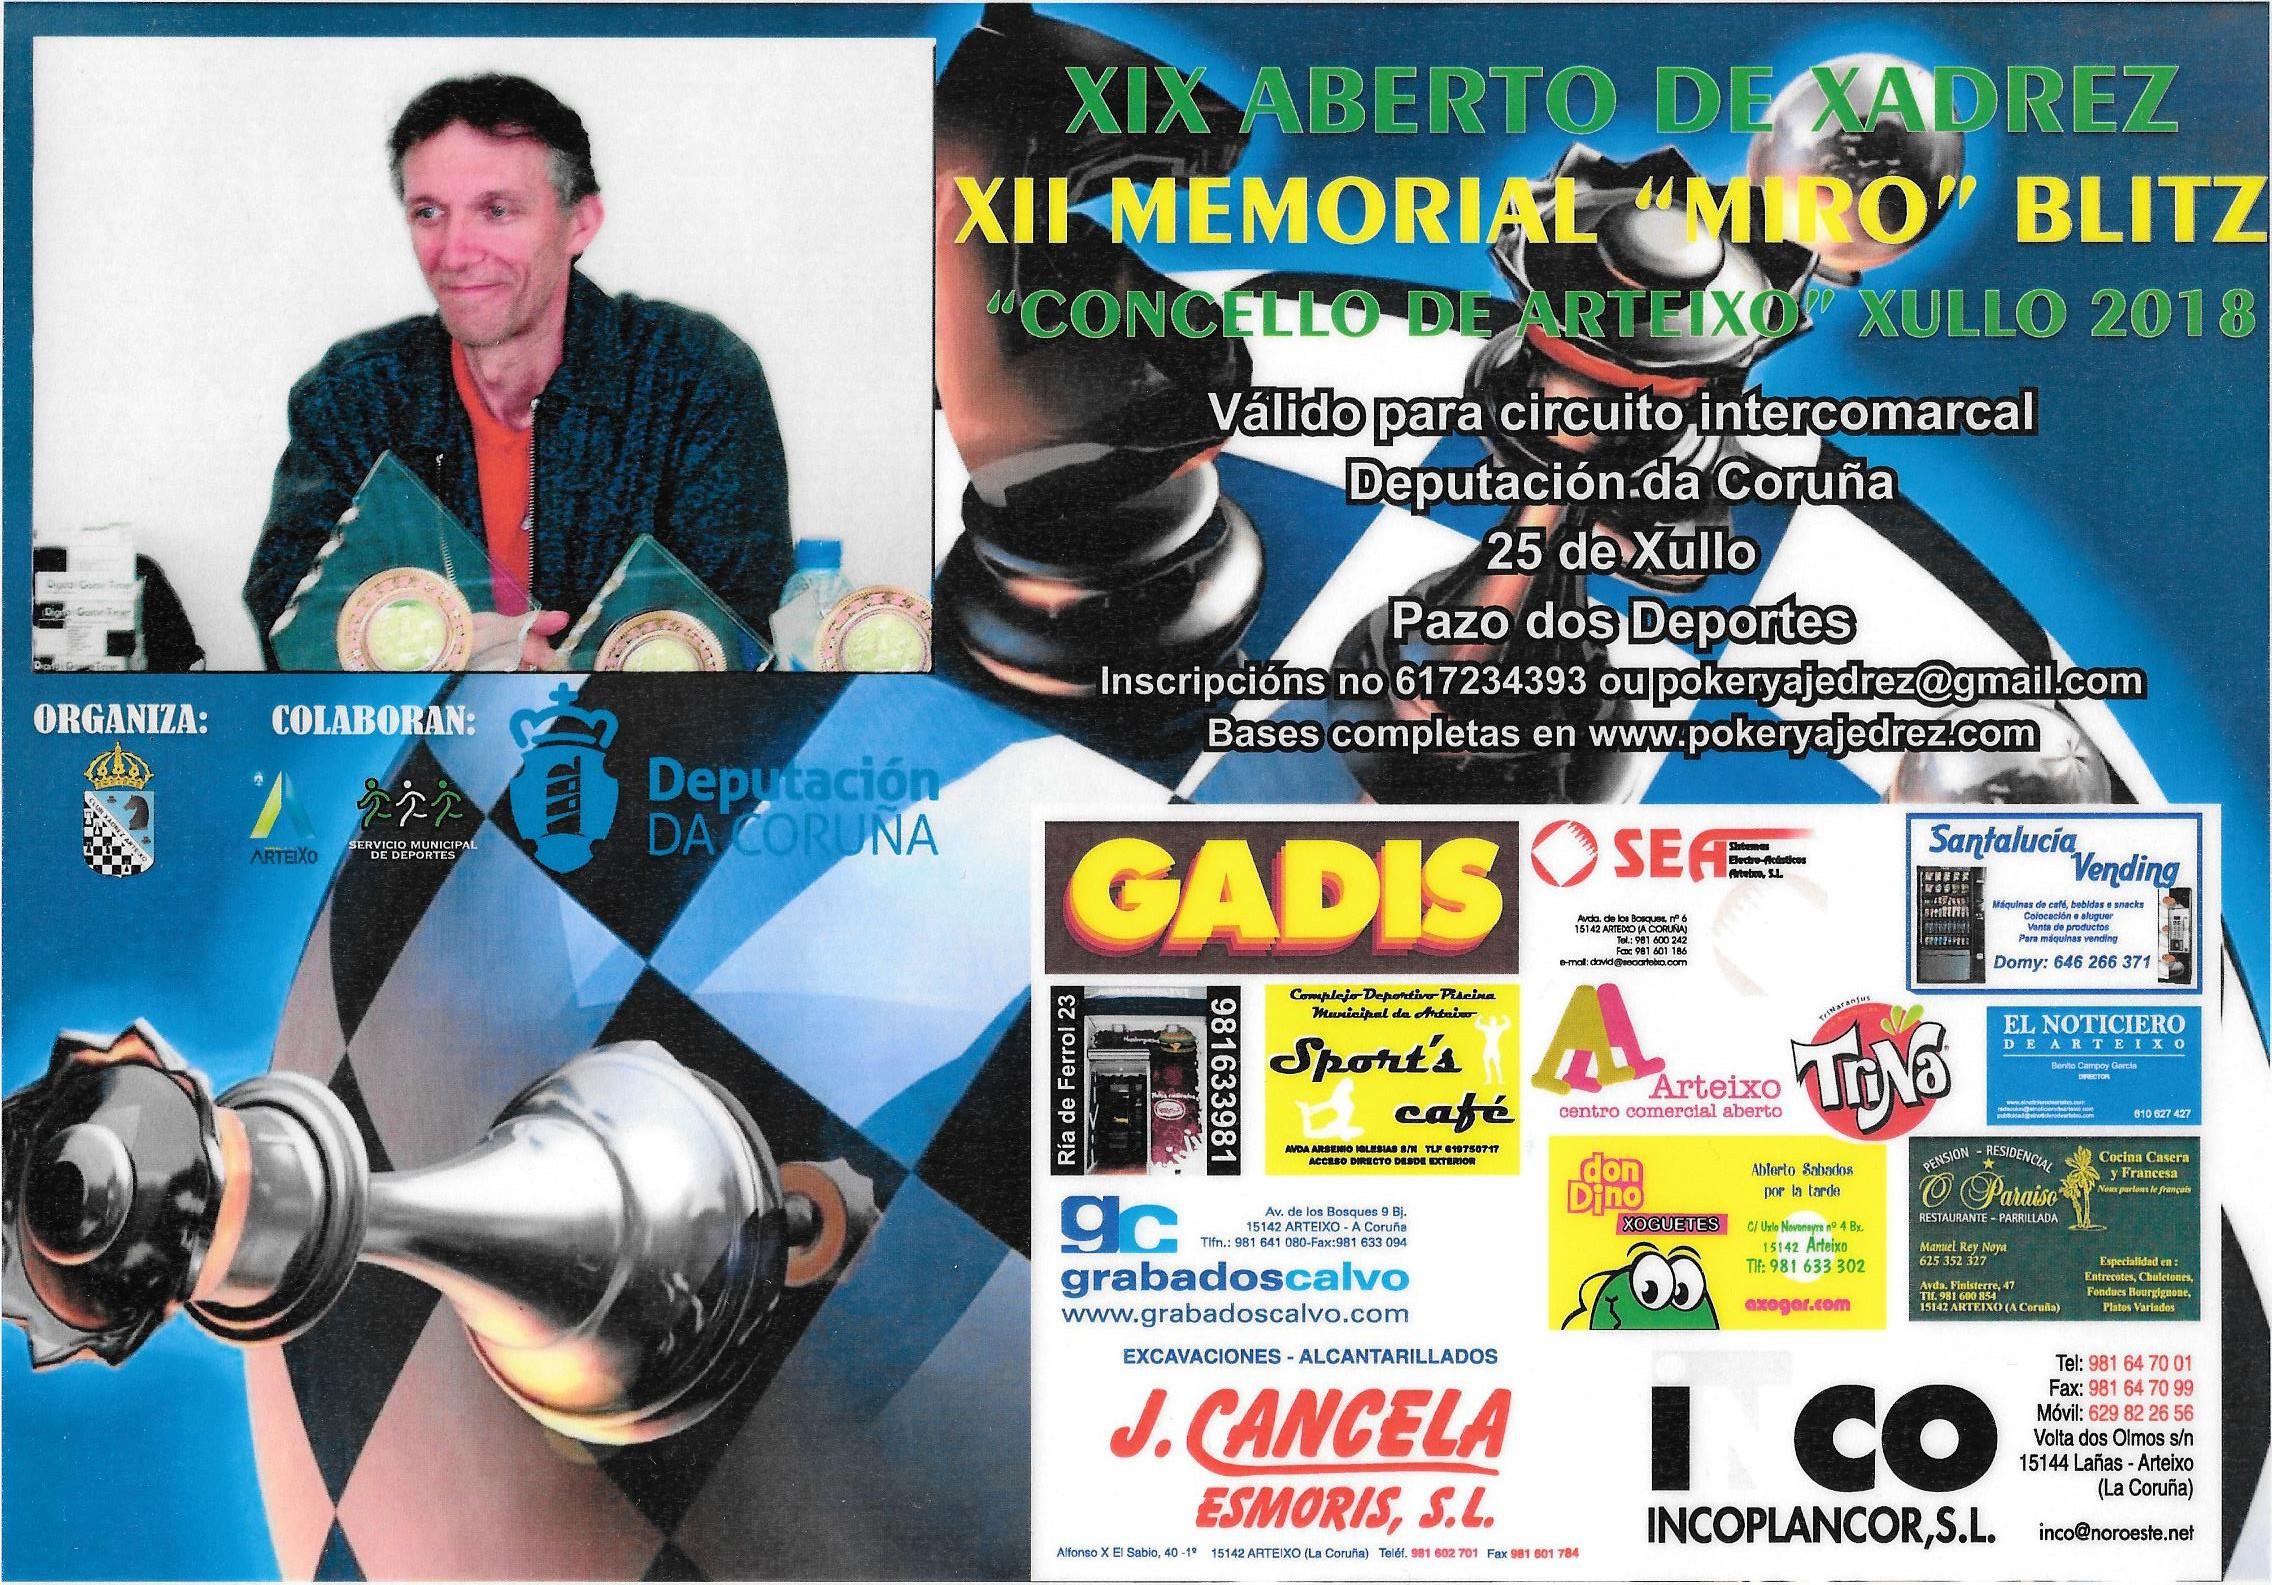 XII Memorial Miro - XIX Aberto Arteixo